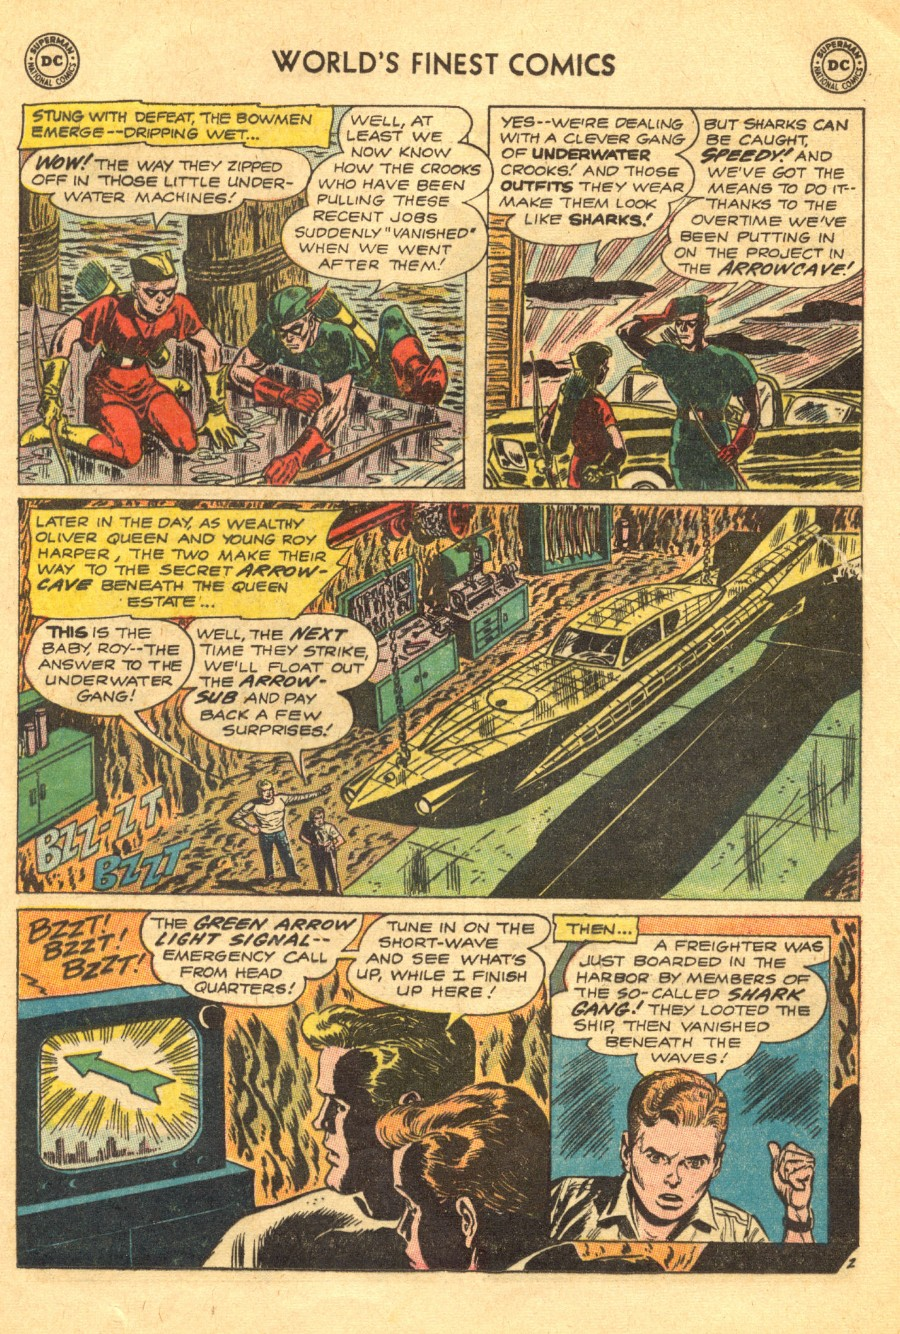 Read online World's Finest Comics comic -  Issue #130 - 29